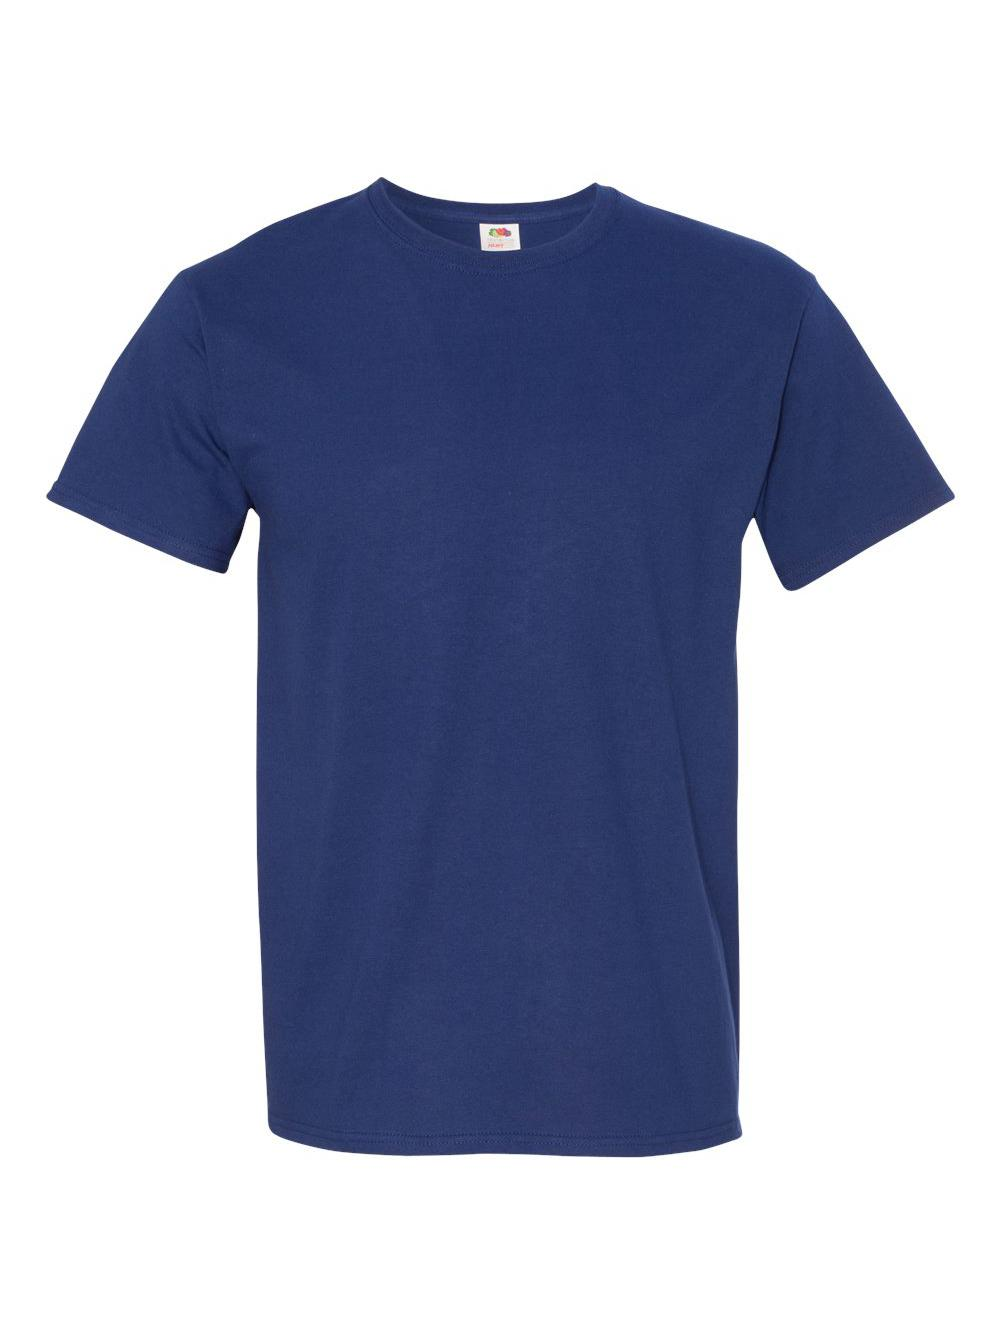 Fruit-of-the-Loom-HD-Cotton-Short-Sleeve-T-Shirt-3930R thumbnail 3